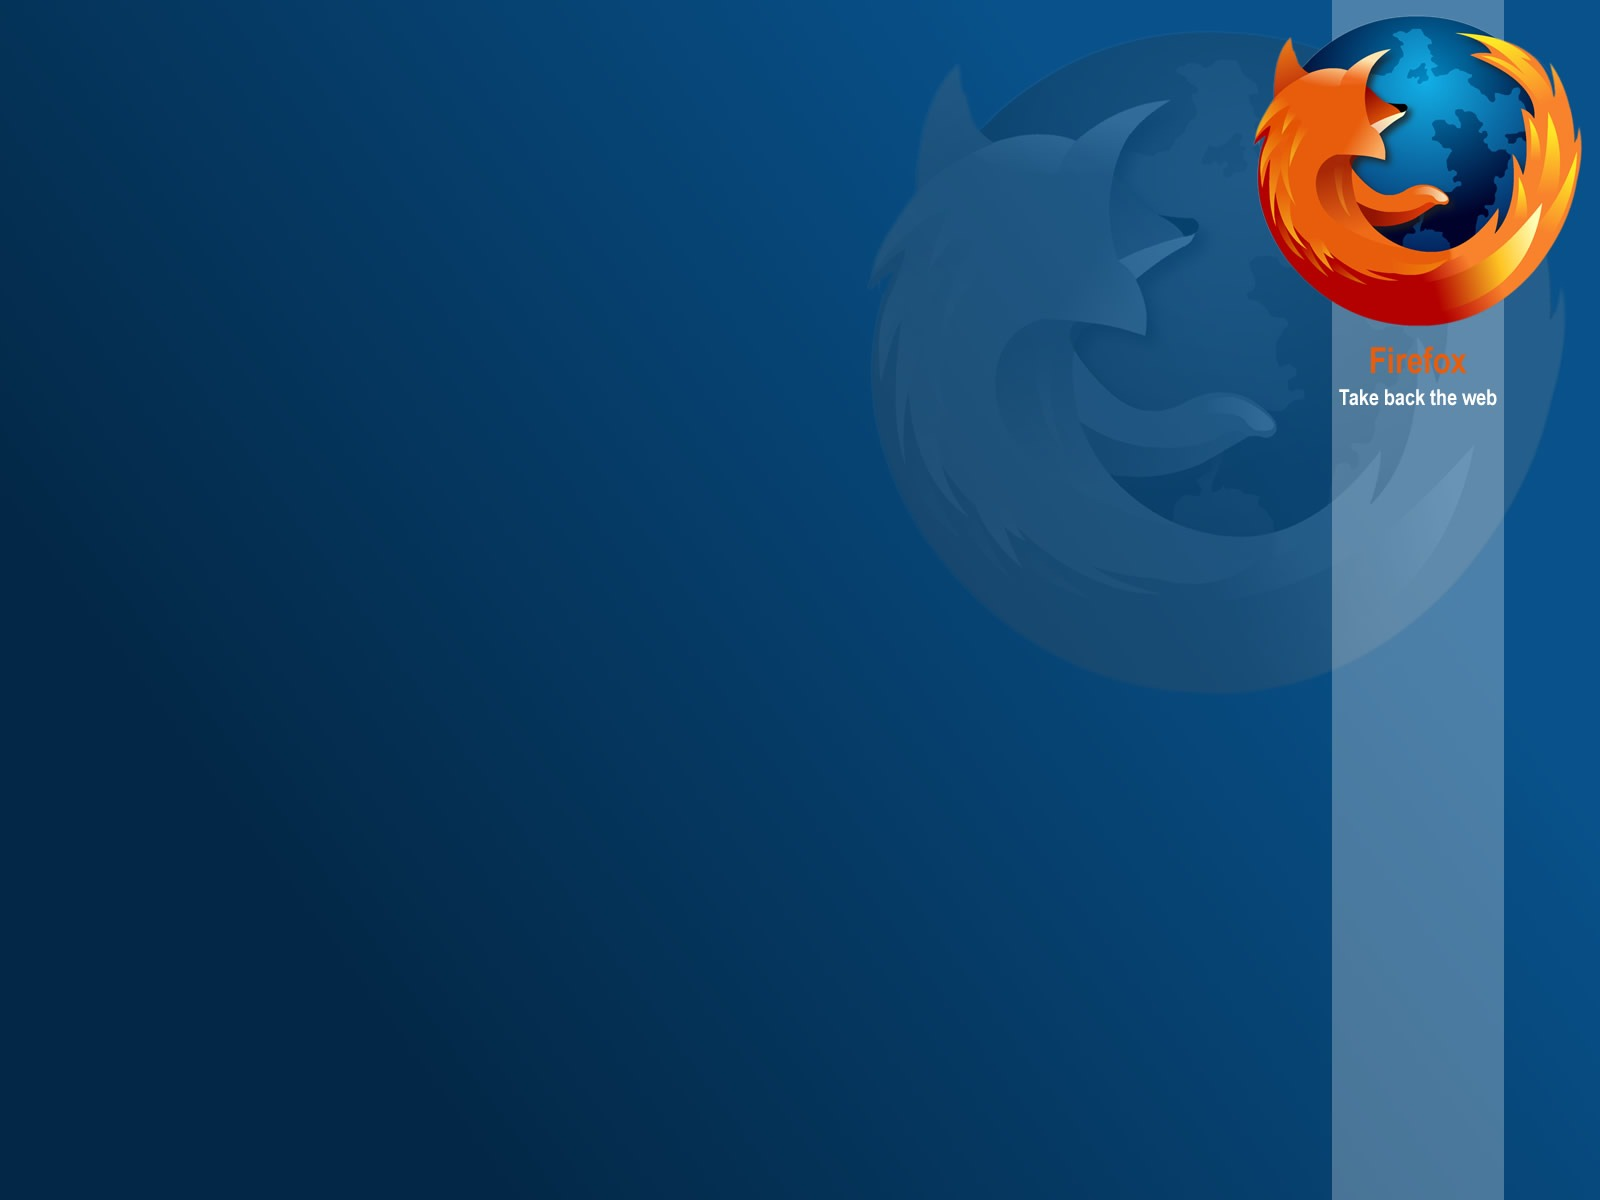 WALLPAPERS HD Firefox Take Back